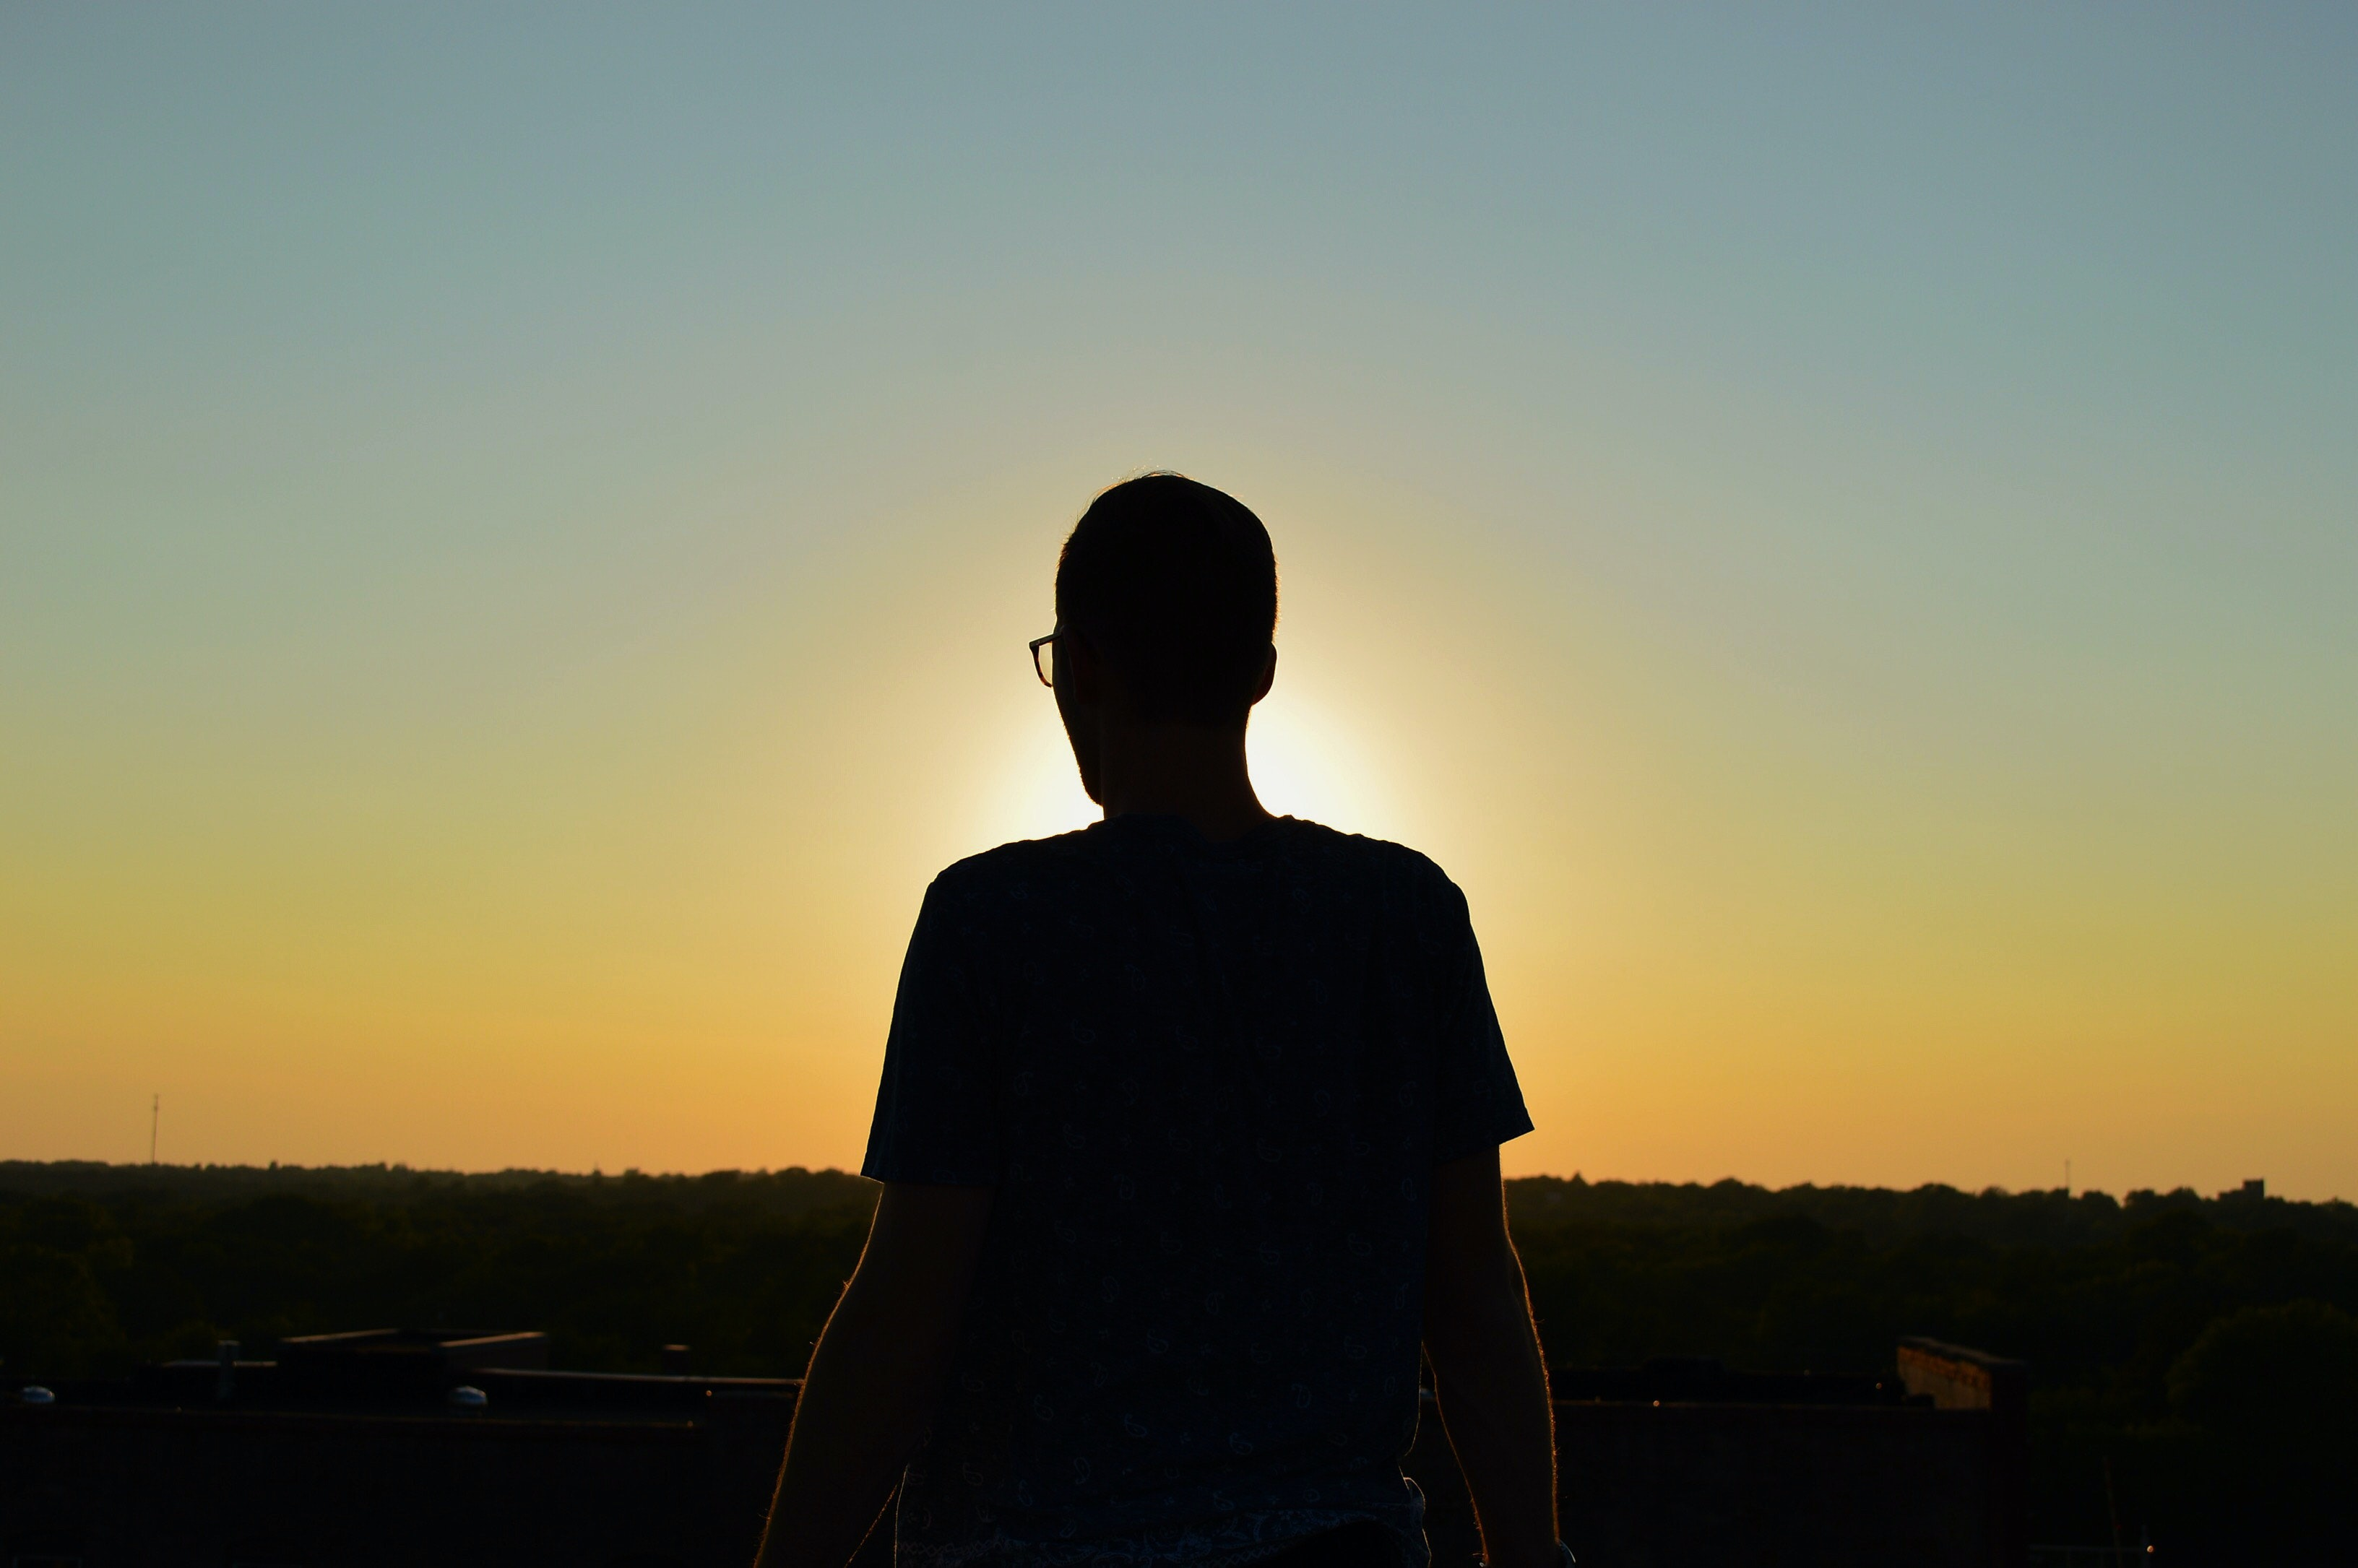 man and woman silhouette walking during sunset  u00b7 free stock photo